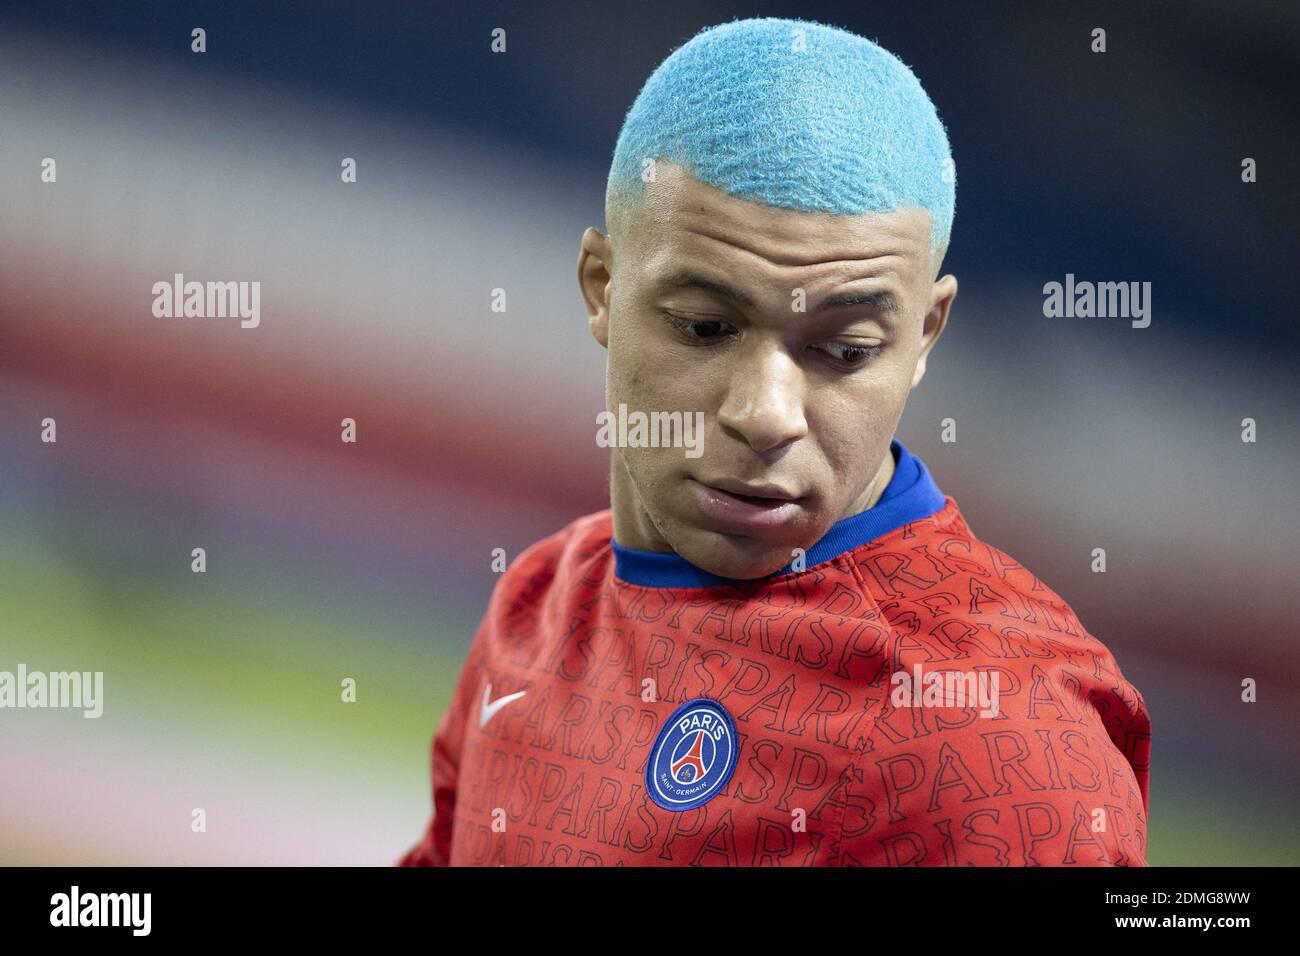 Kylian Mbappe di Parigi Saint Germain sport nuovi capelli blu ...